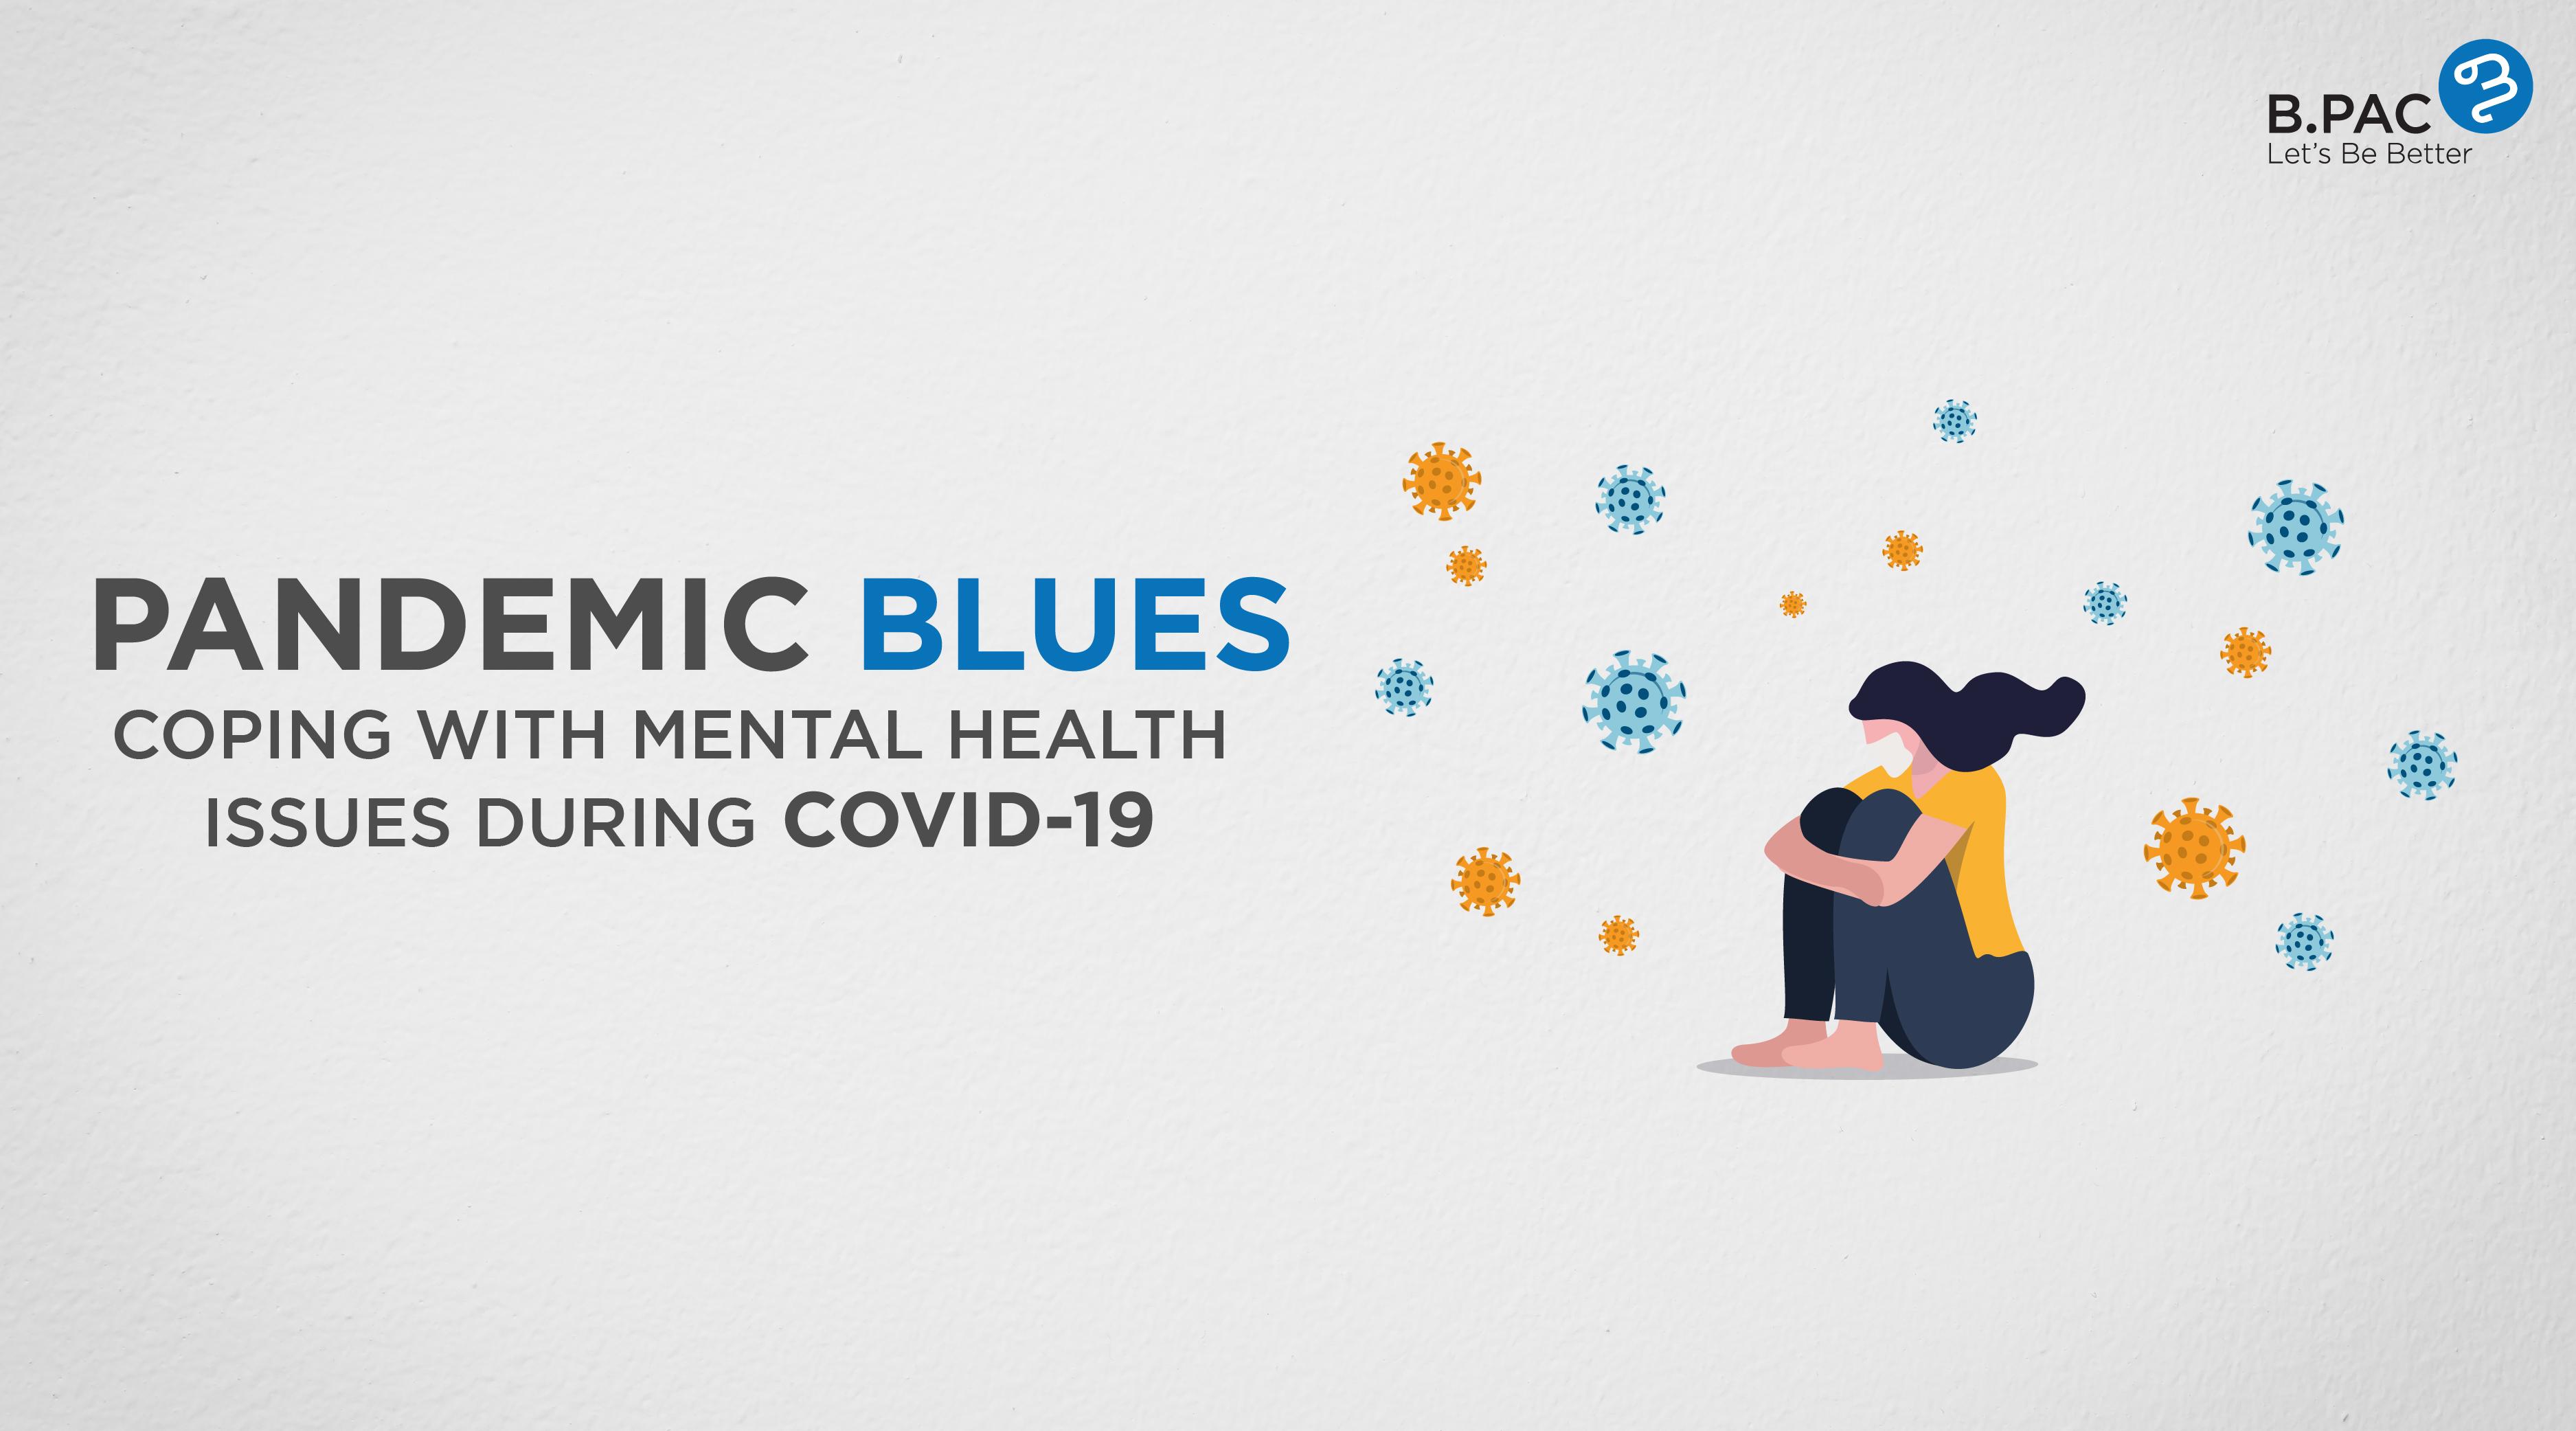 pandemic blues - covid 19